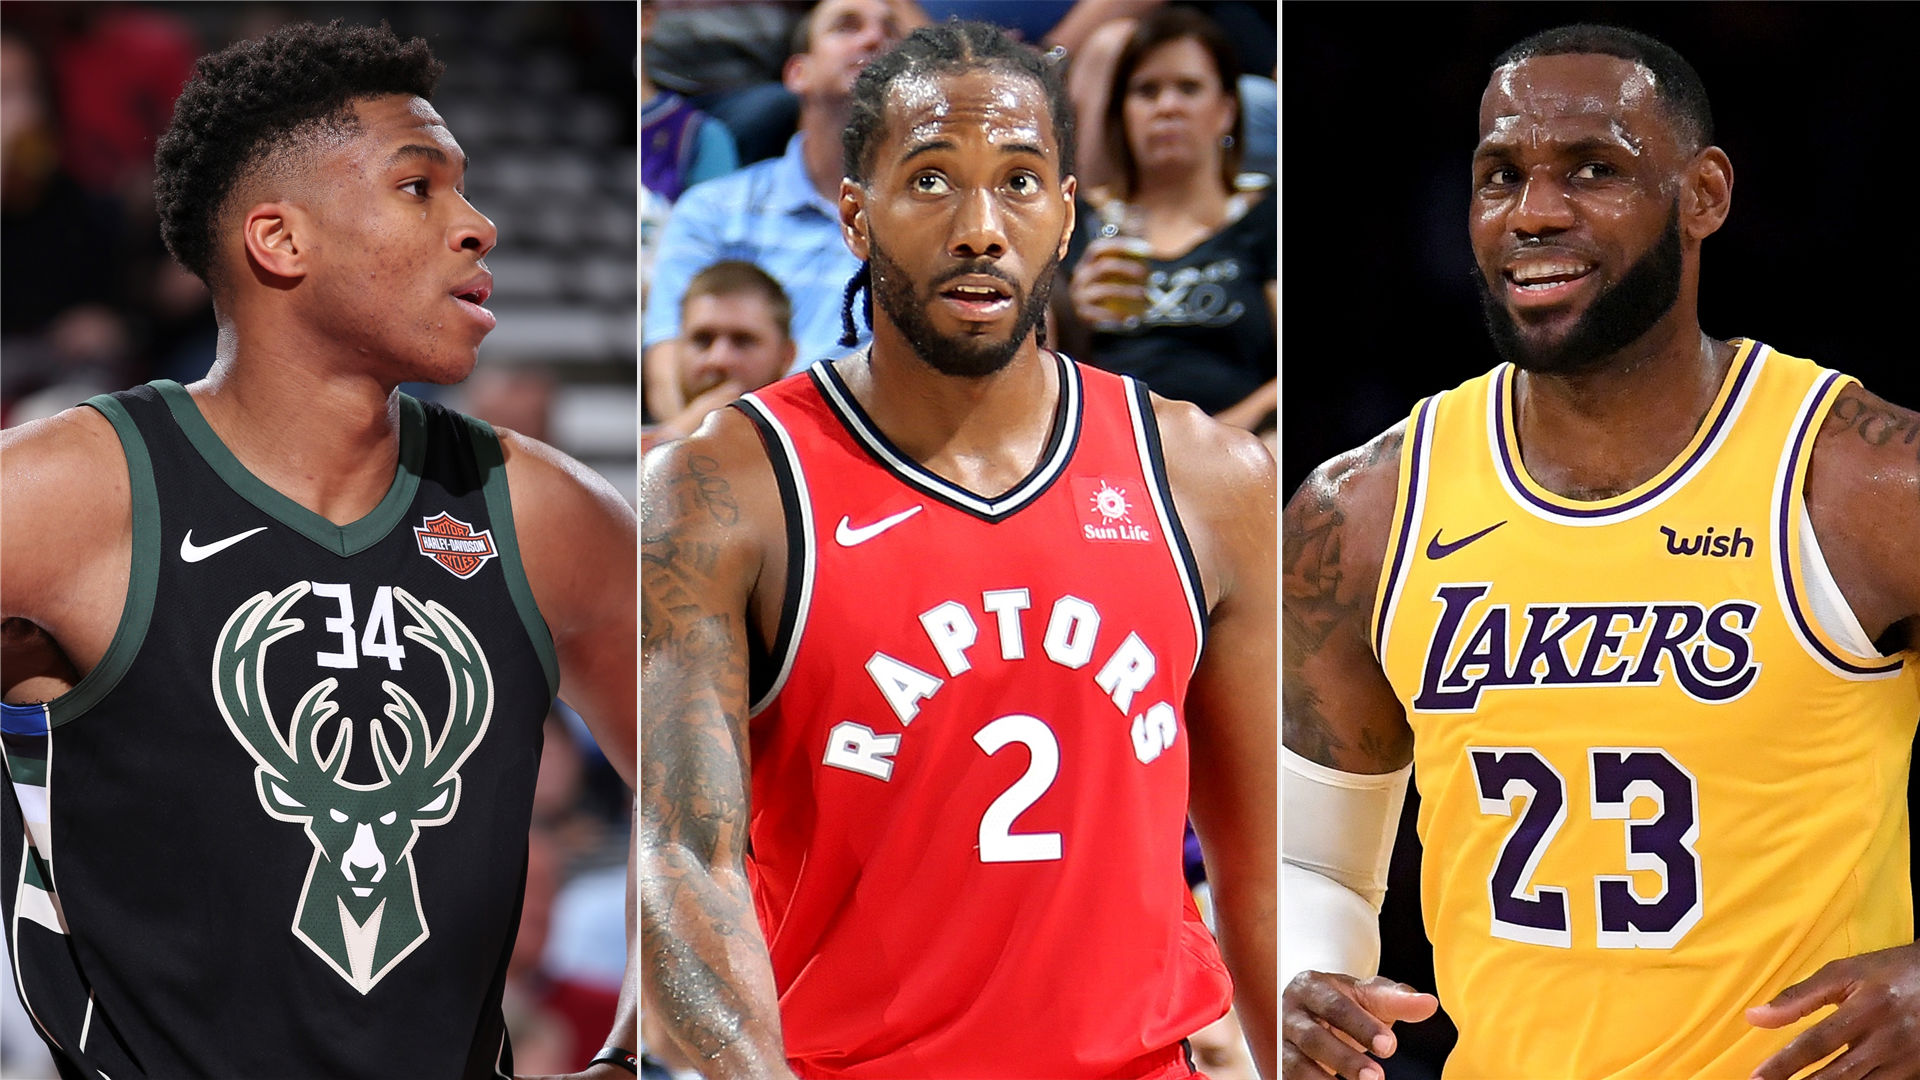 Giannis Antetokounmpo, Kawhi Leonard and LeBron James headline NBA.com's 2018-19 GM survey   NBA.com Canada   The official site of the NBA